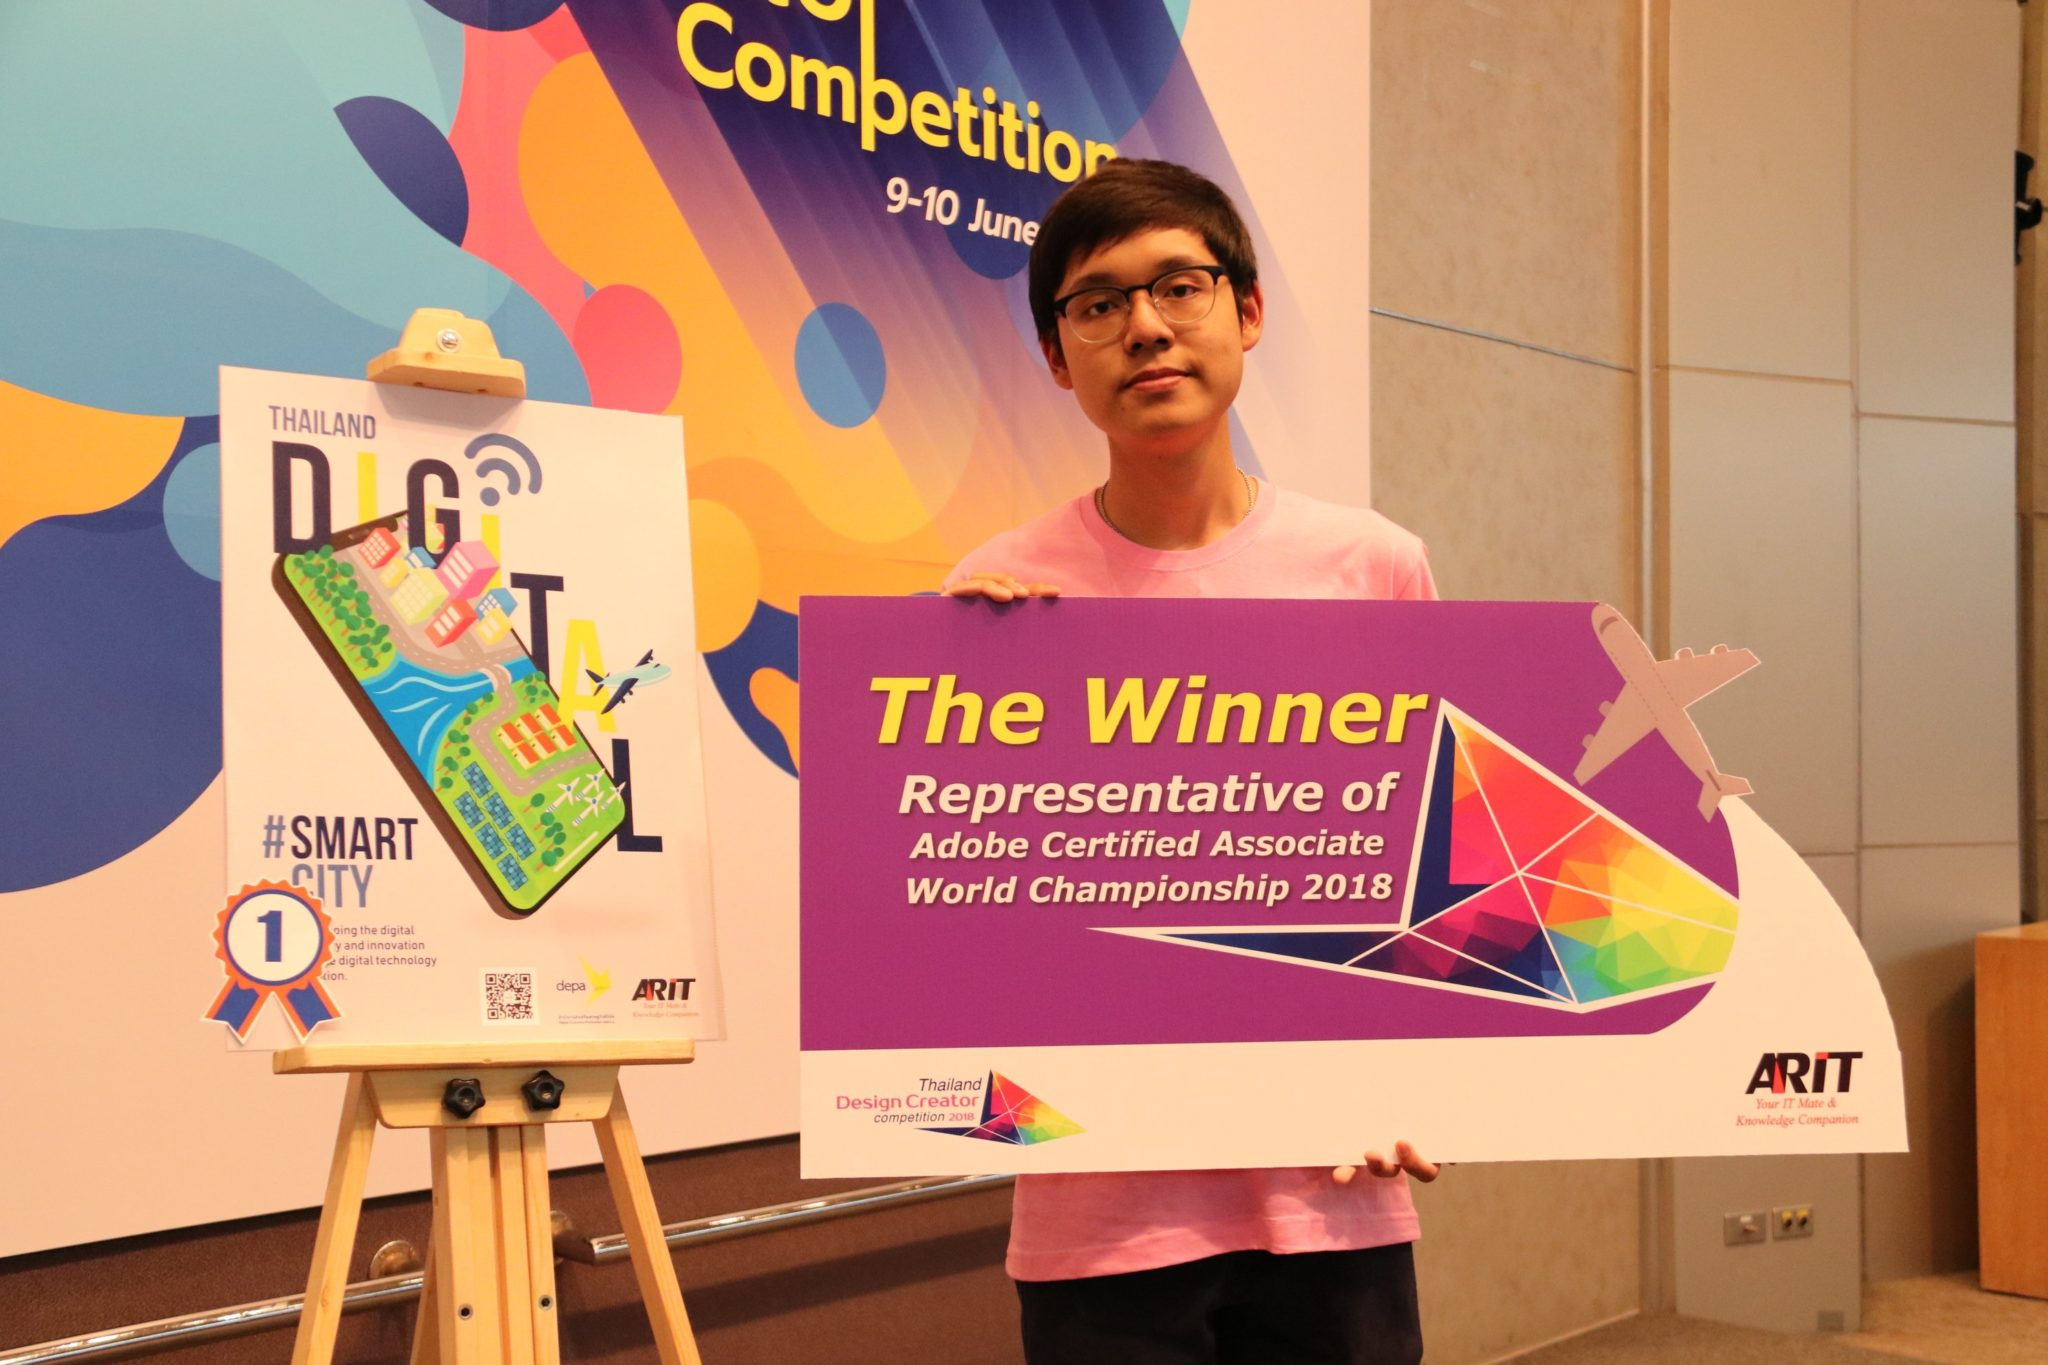 ARIT แสดงความยินดีกับ เยาวชนไทยคว้าแชมป์เวที Thailand Design Creator Competition 2018